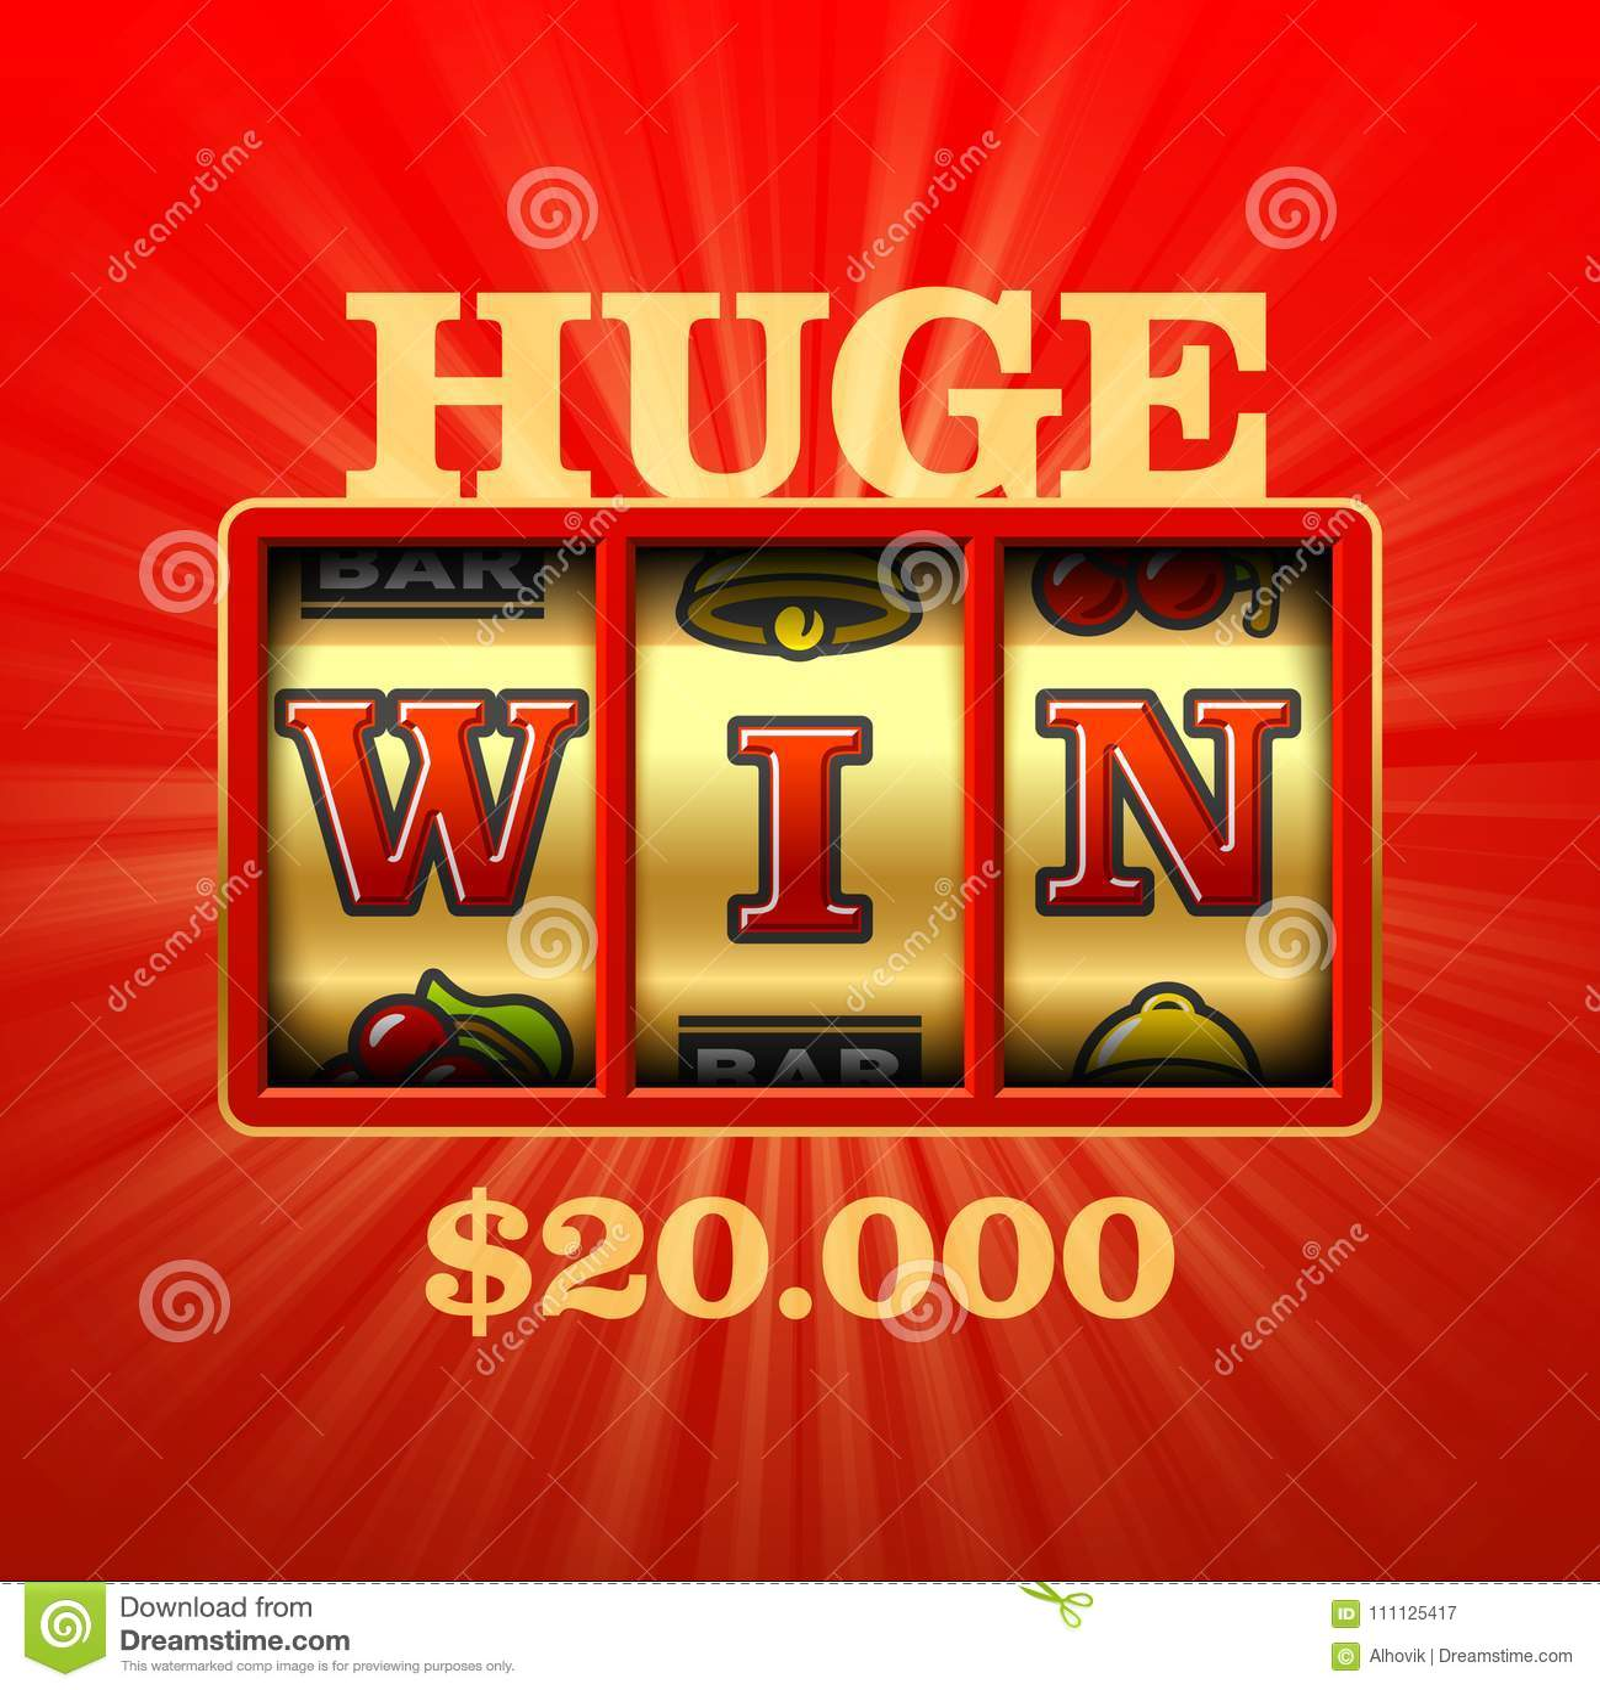 Ogromny wygrany kasyna sztandar